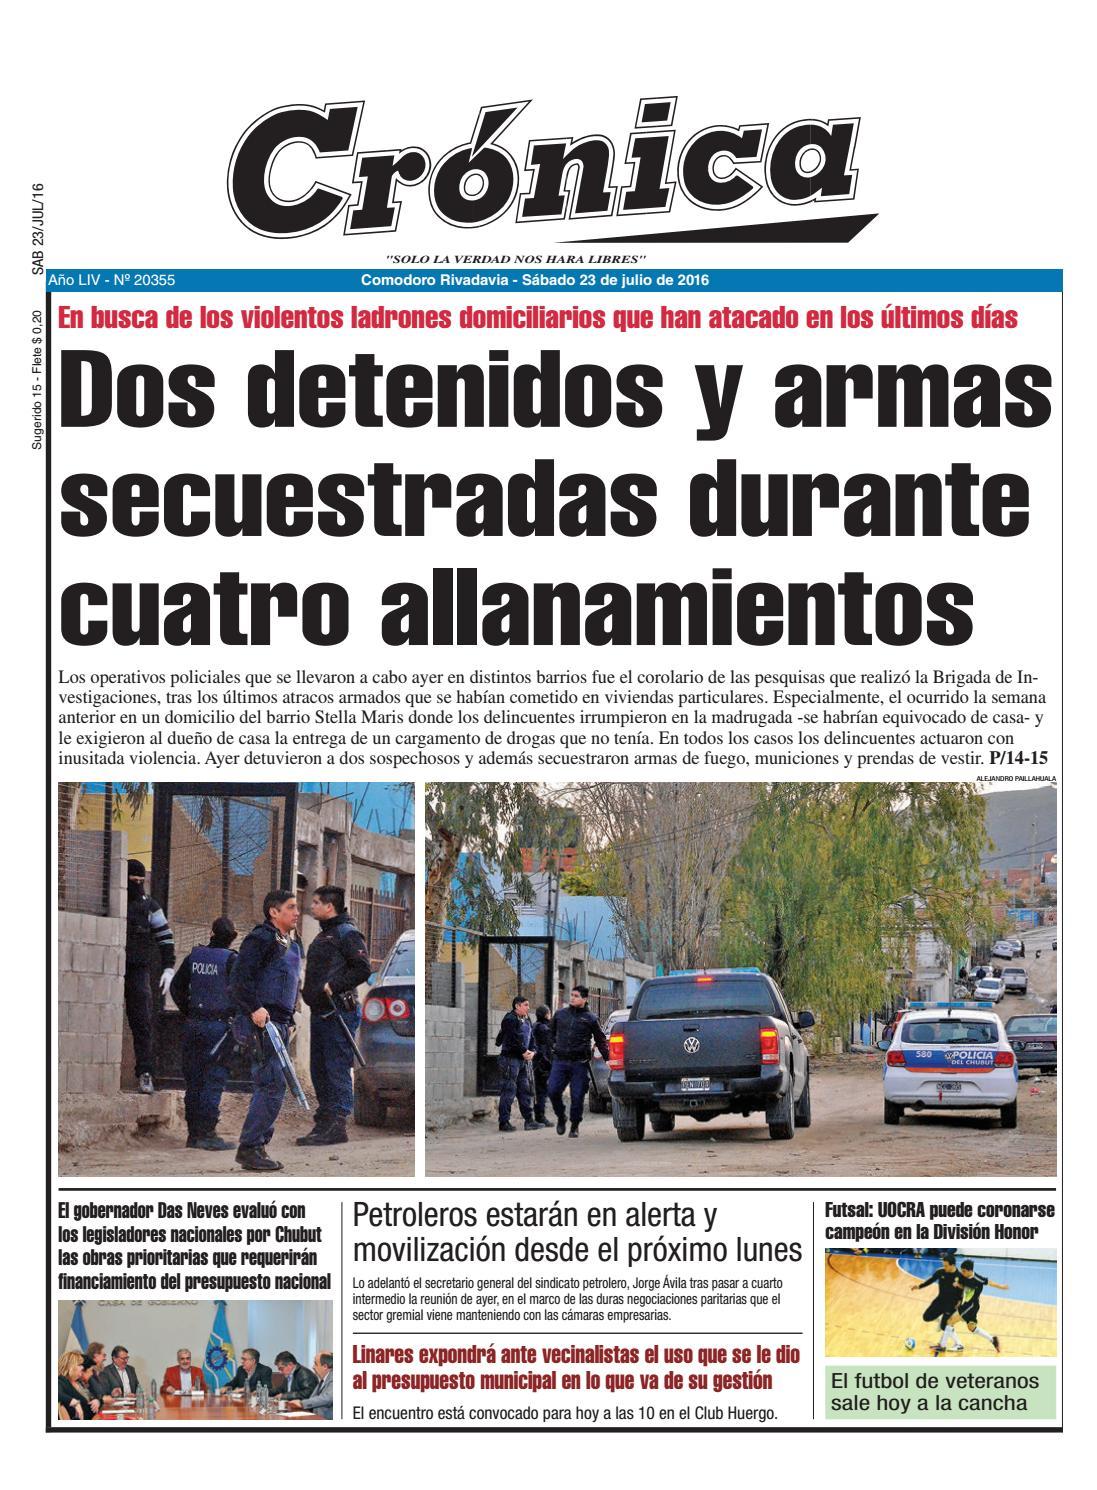 459ec89de5033603864e3473ccb04932 by Diario Crónica - issuu